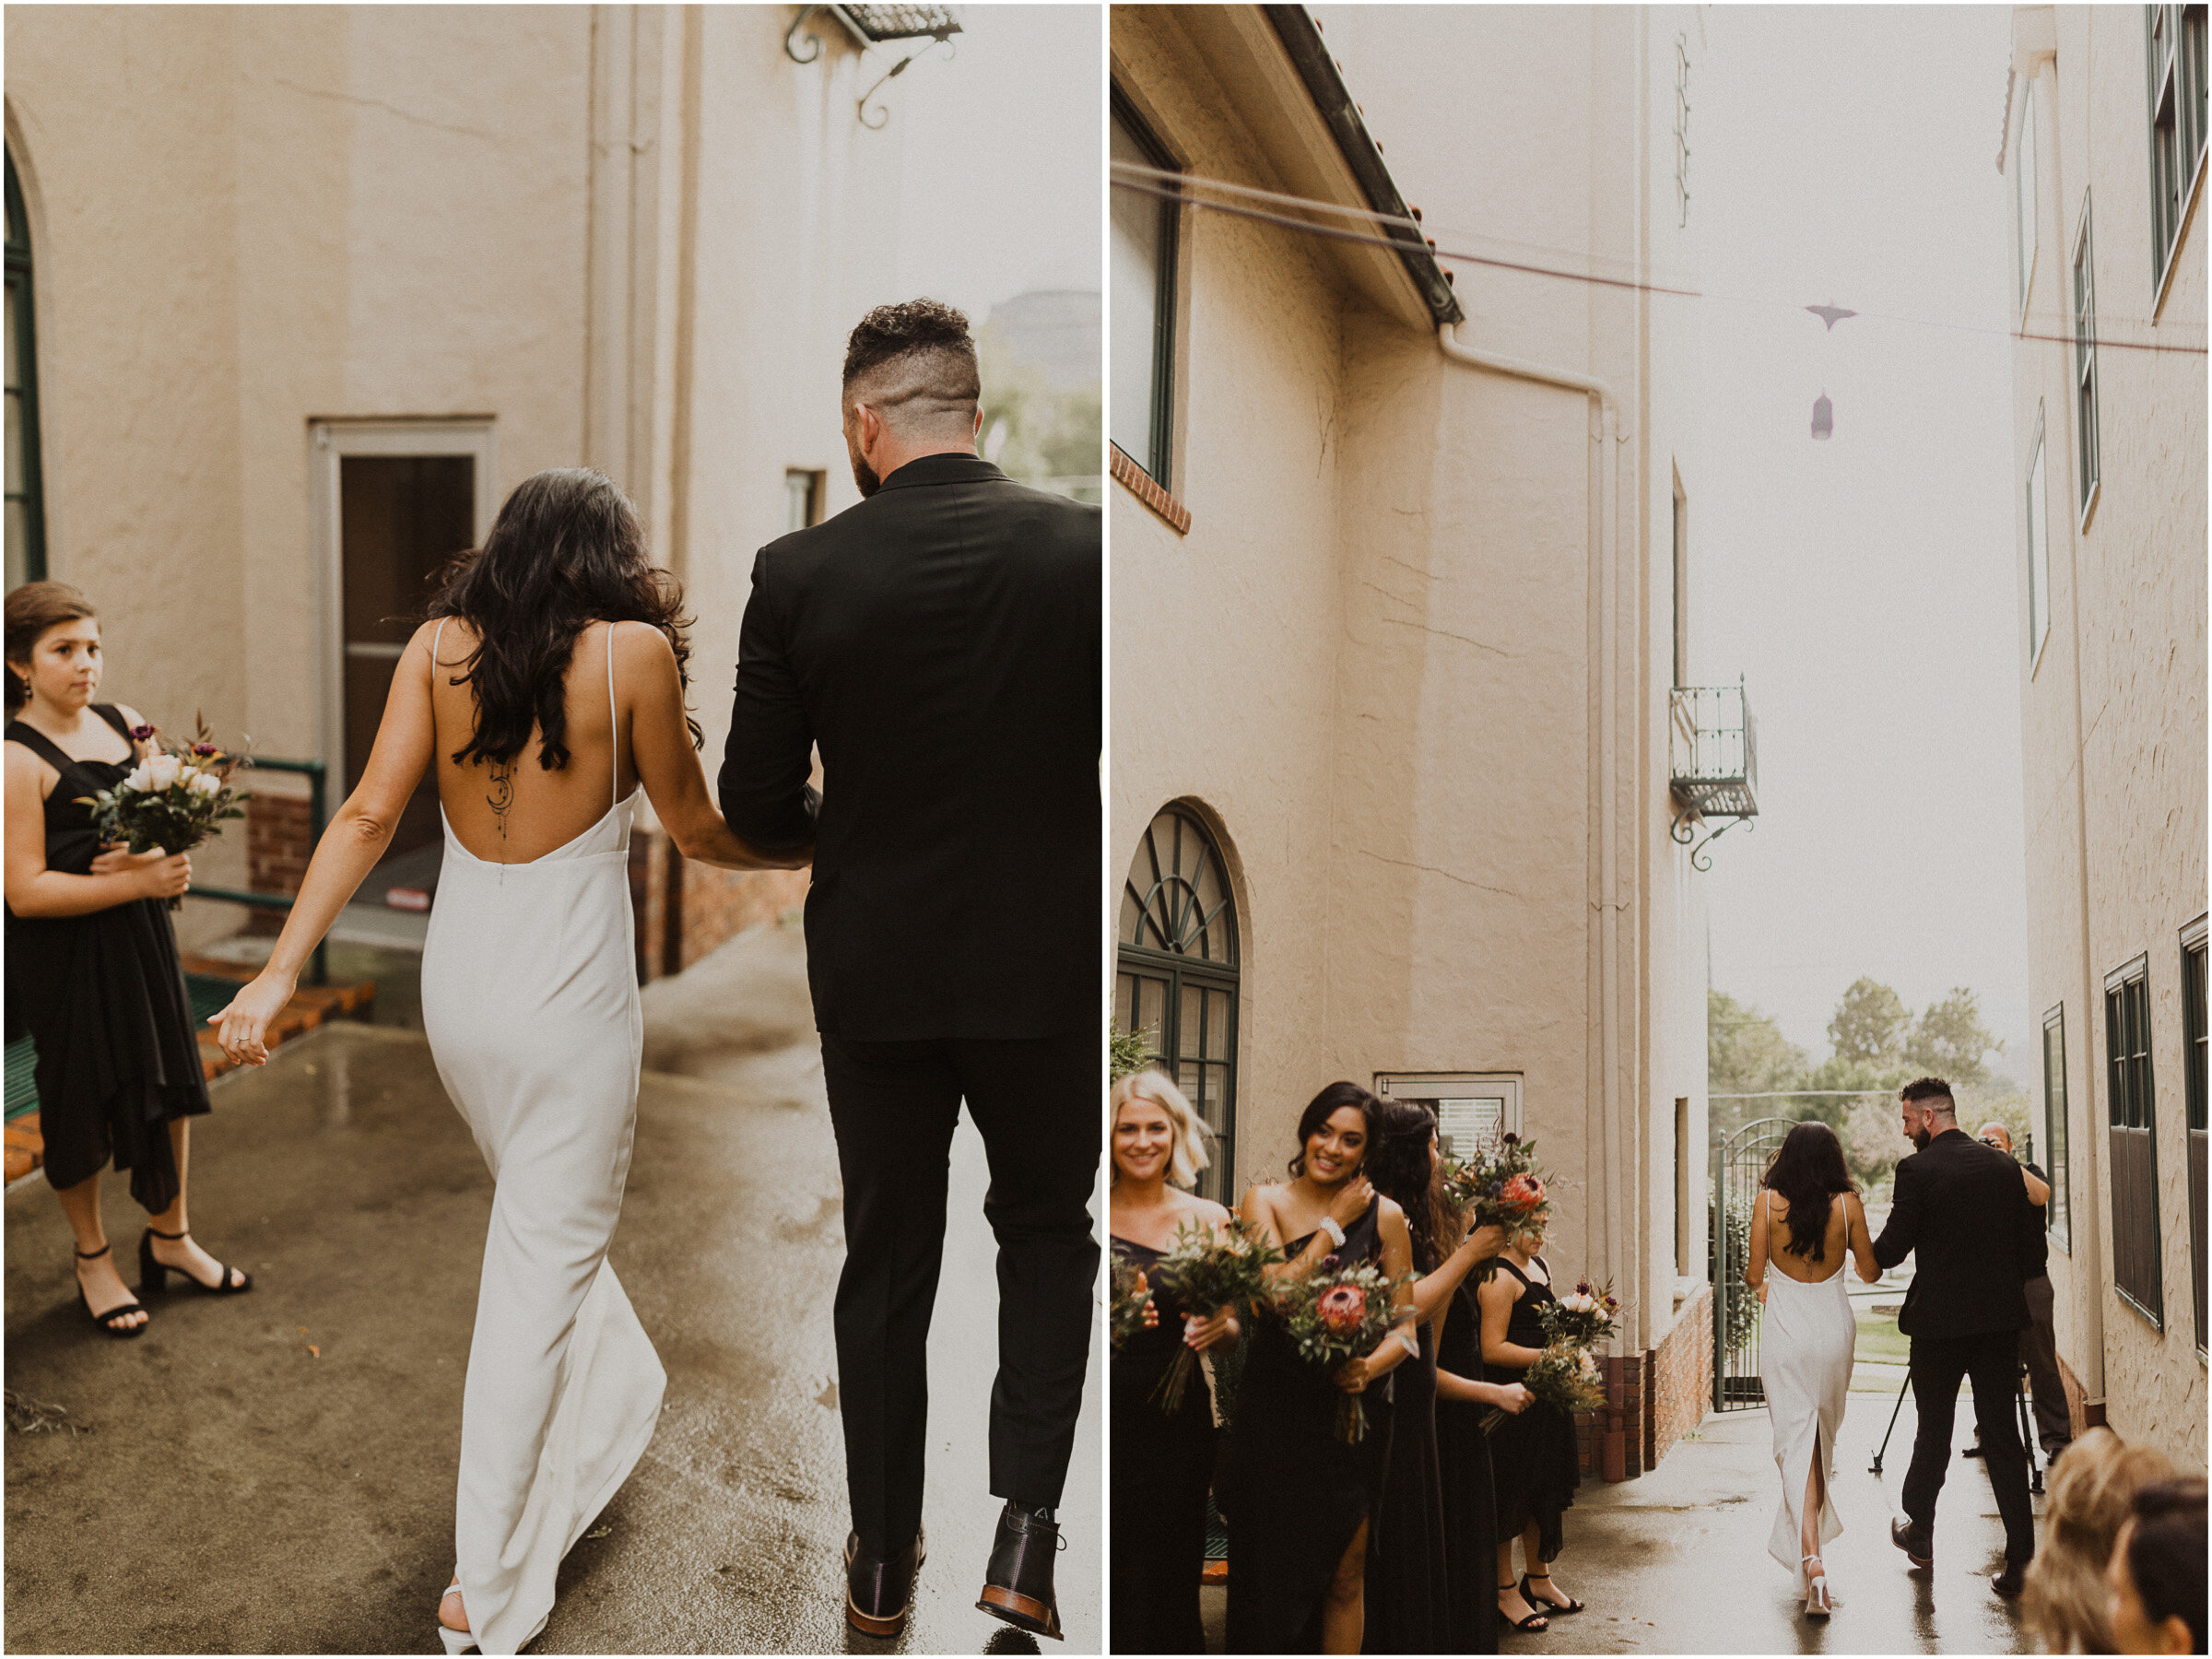 alyssa barletter photography la villa kansas city patio wedding sarah seven wedding dress-17.jpg